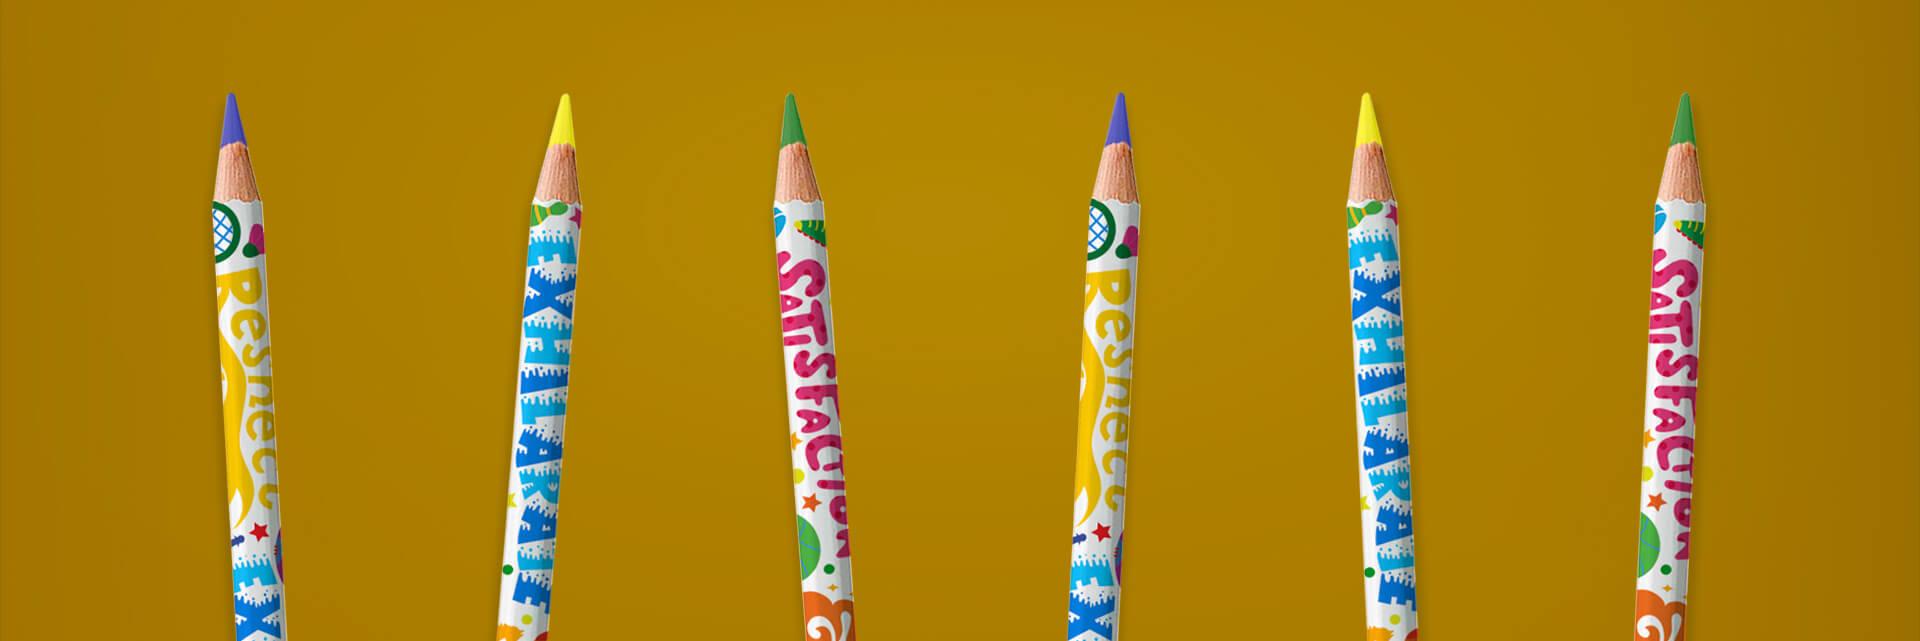 Pencil_Website